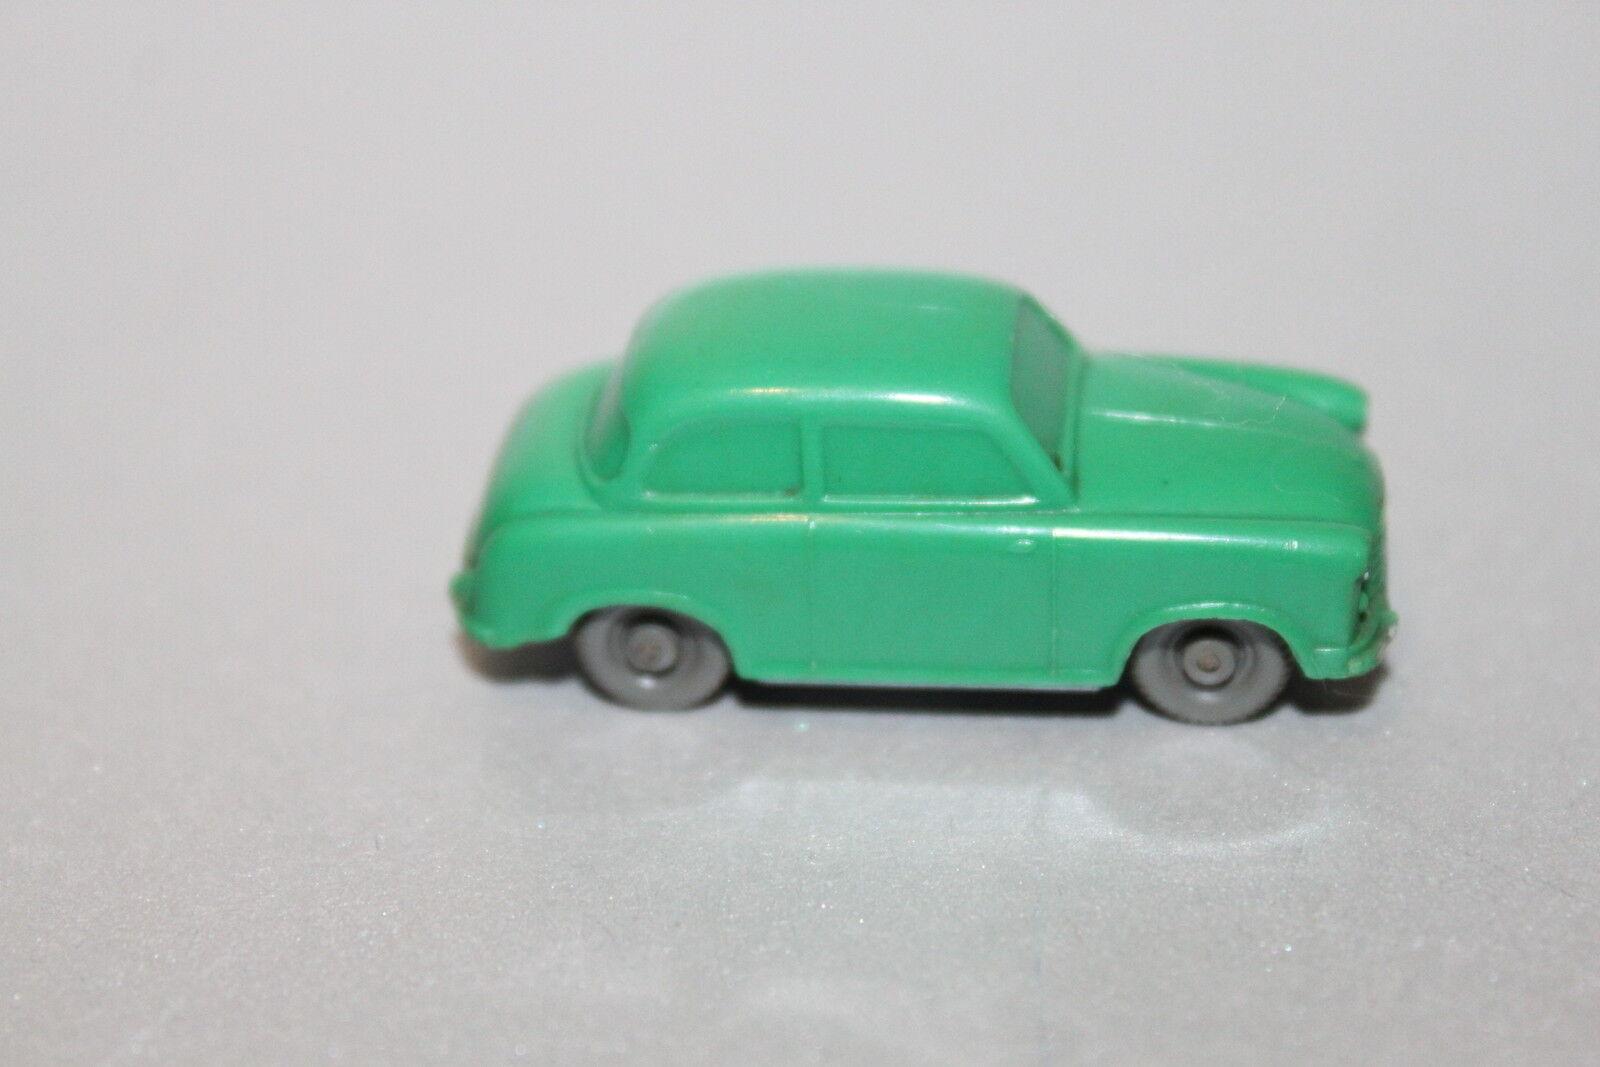 Wiking Wiking Wiking 40/11 Lloyd vert vitres BJ 1957-59 piste h0 433811